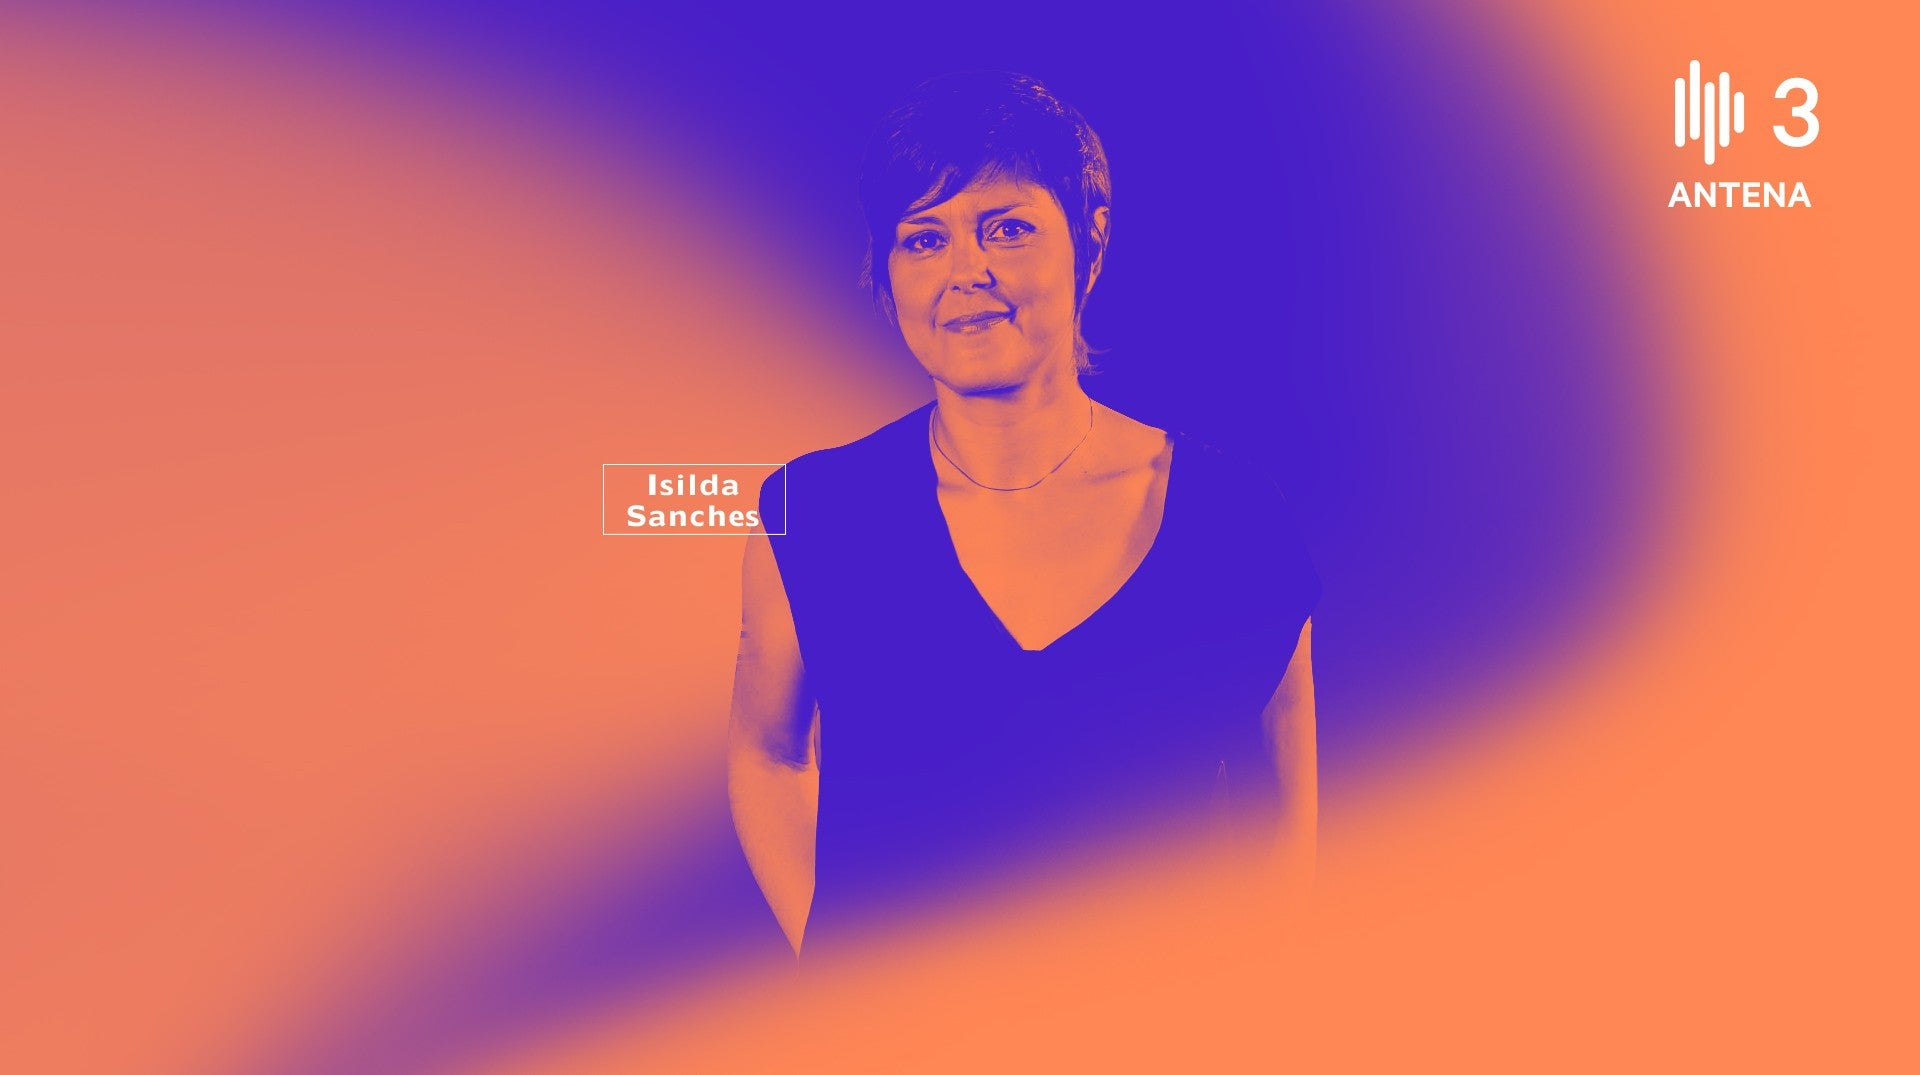 Isilda Sanches